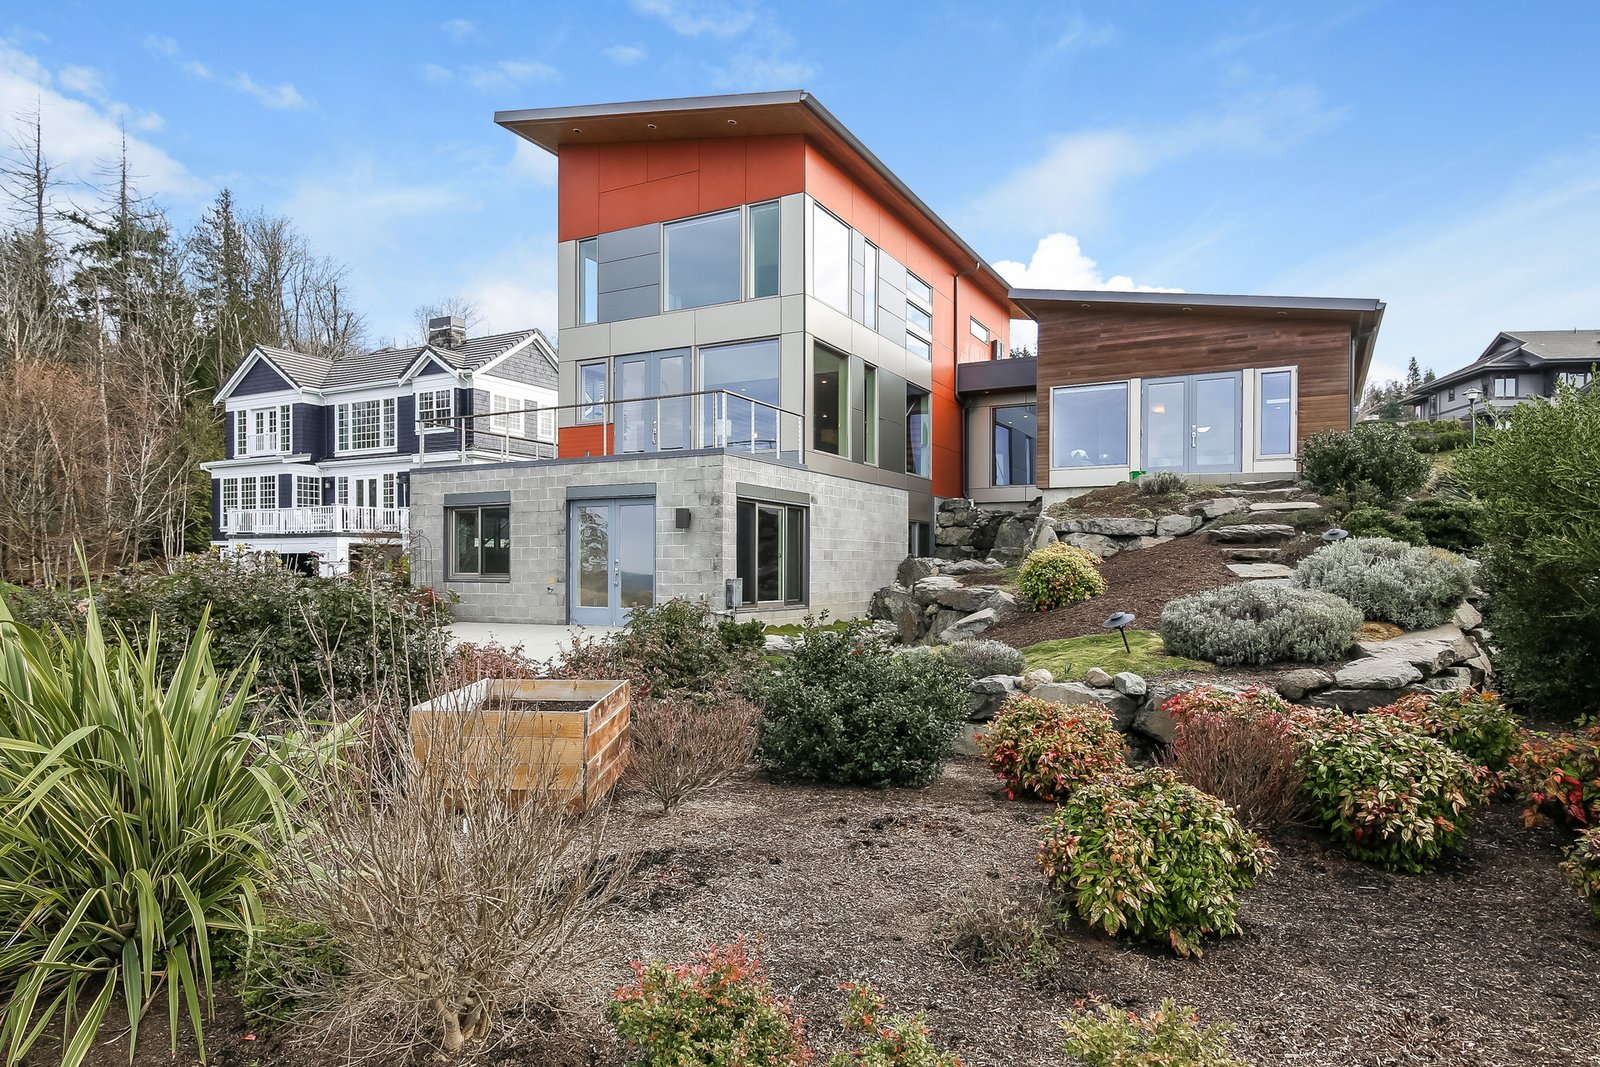 Outdoor, Shrubs, Walkways, Boulders, Back Yard, and Gardens  Japanese Builder Ichijo Creates Net-Zero Energy Home by PlanOmatic